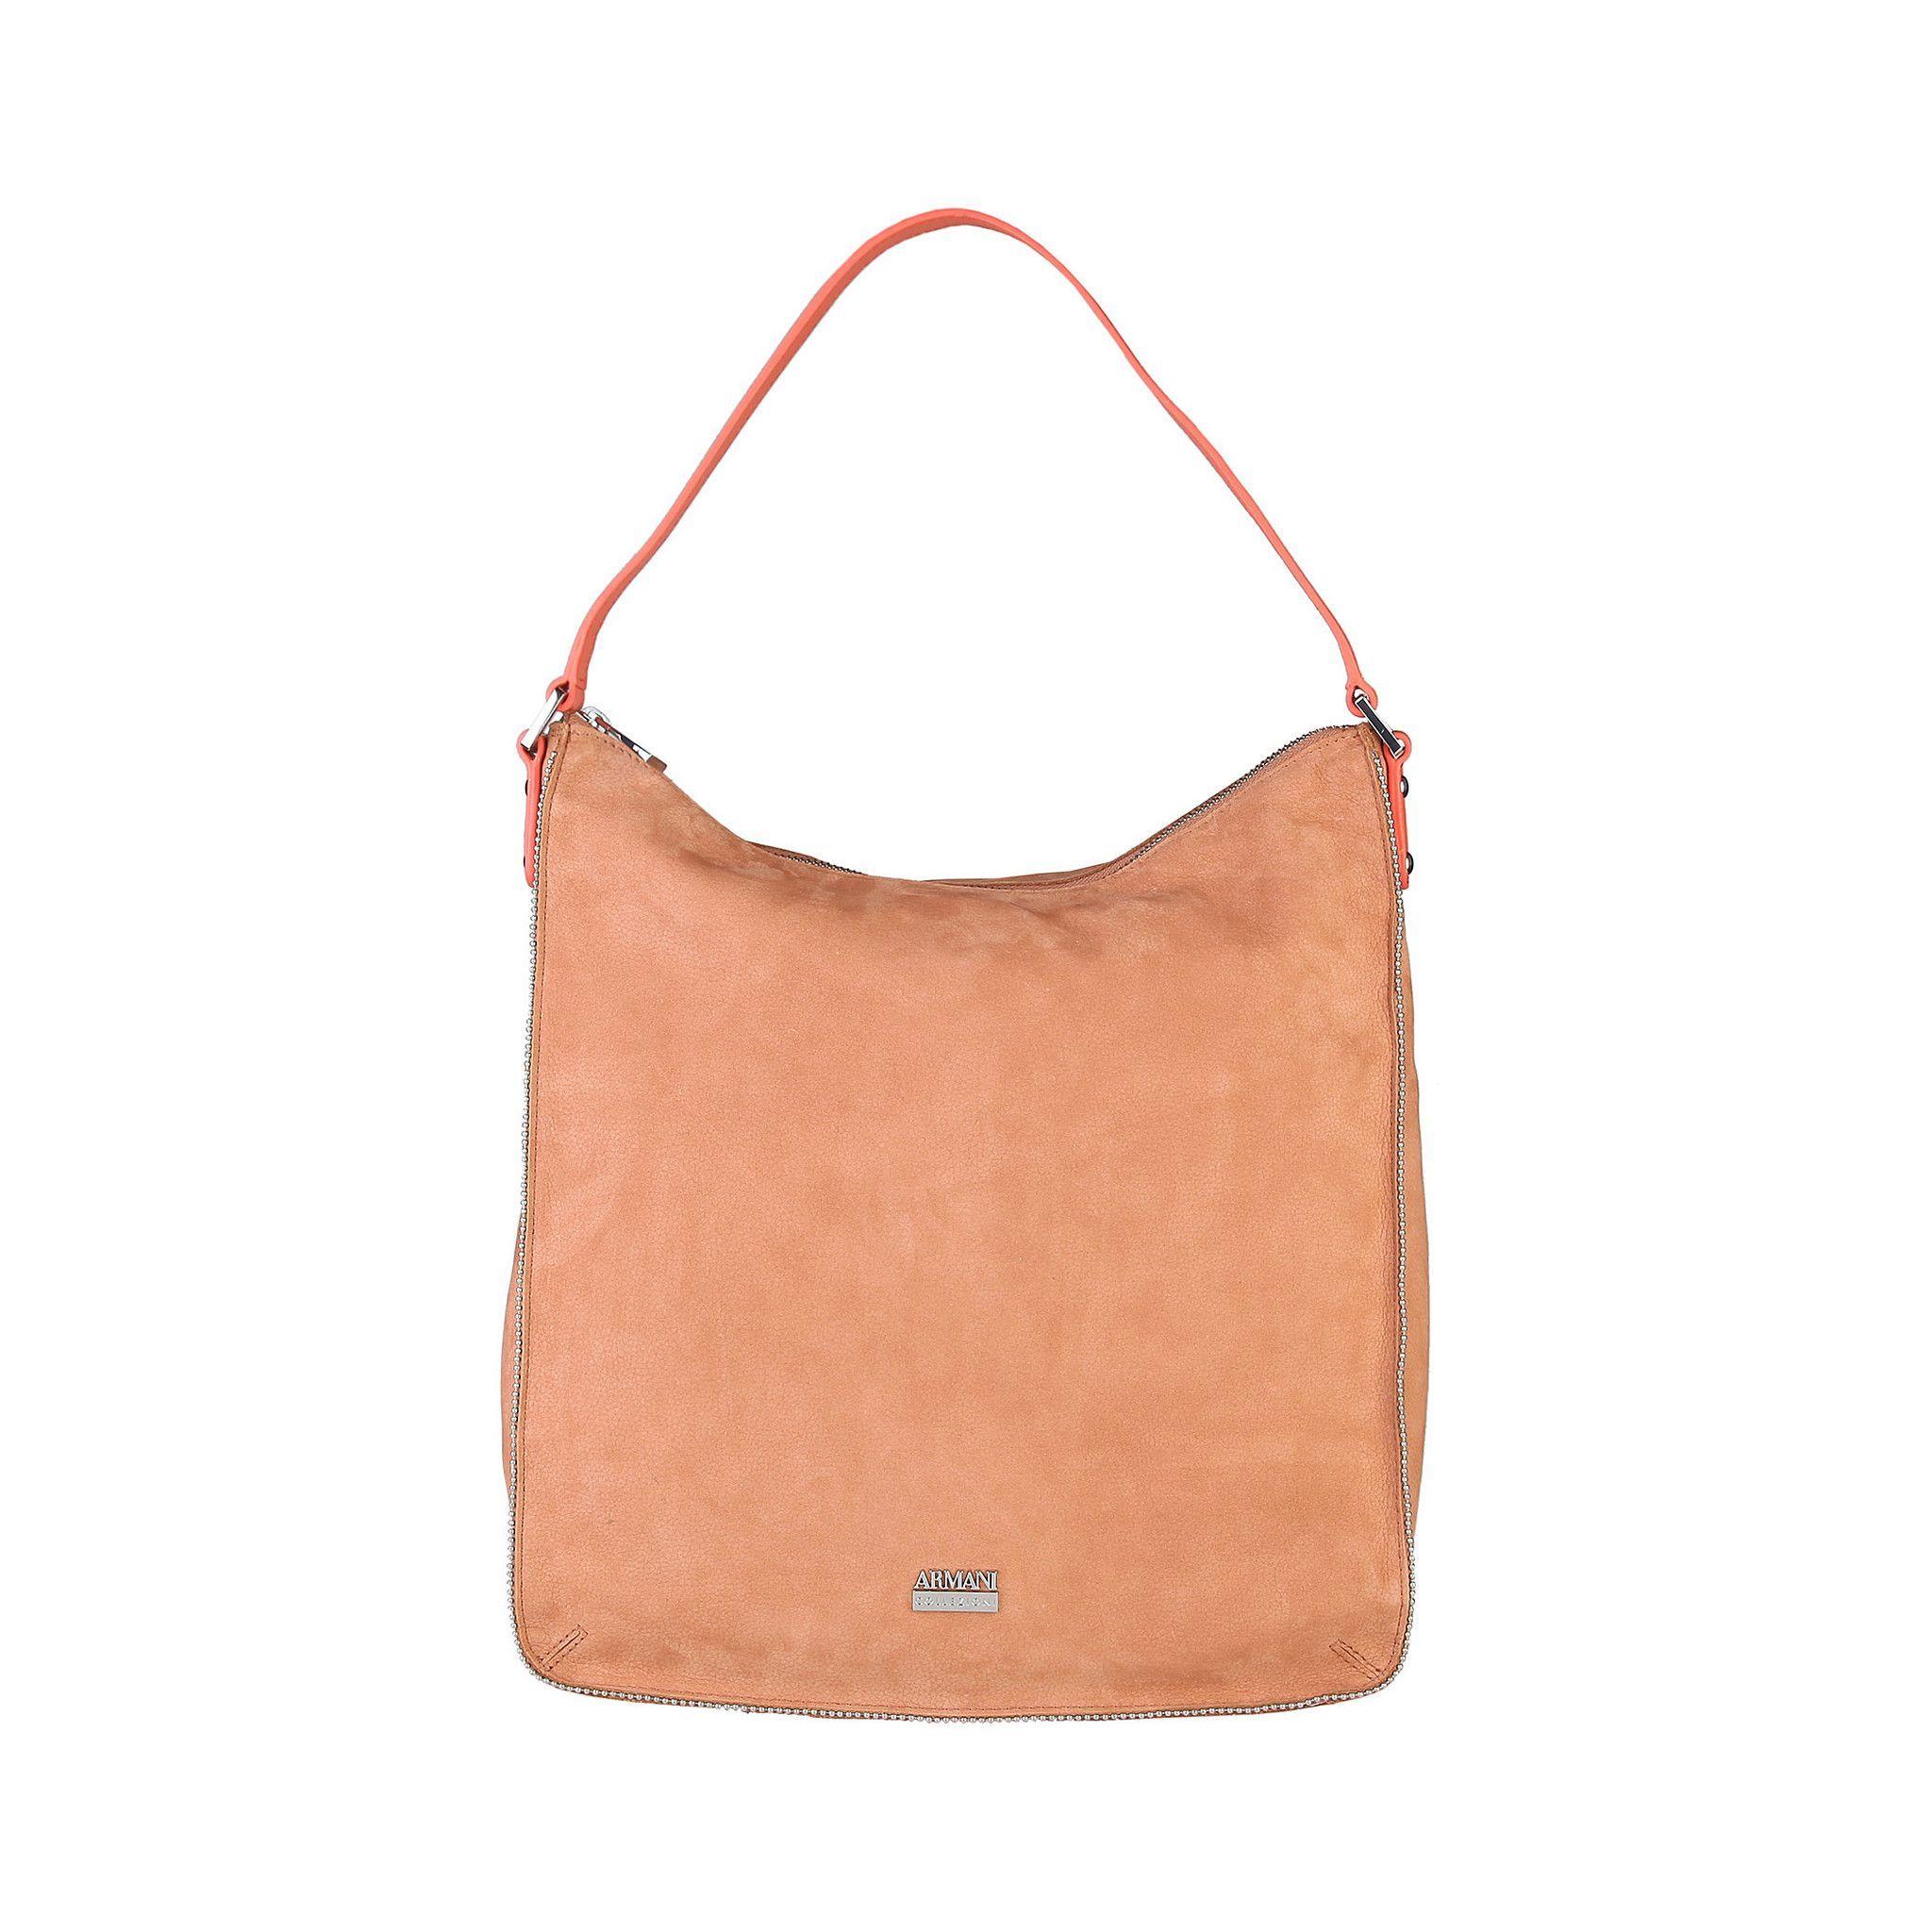 Armani Shoulder Bags On Sale - € 264.30  Armani  Bags  Fashion  Offers   Women ea90259022